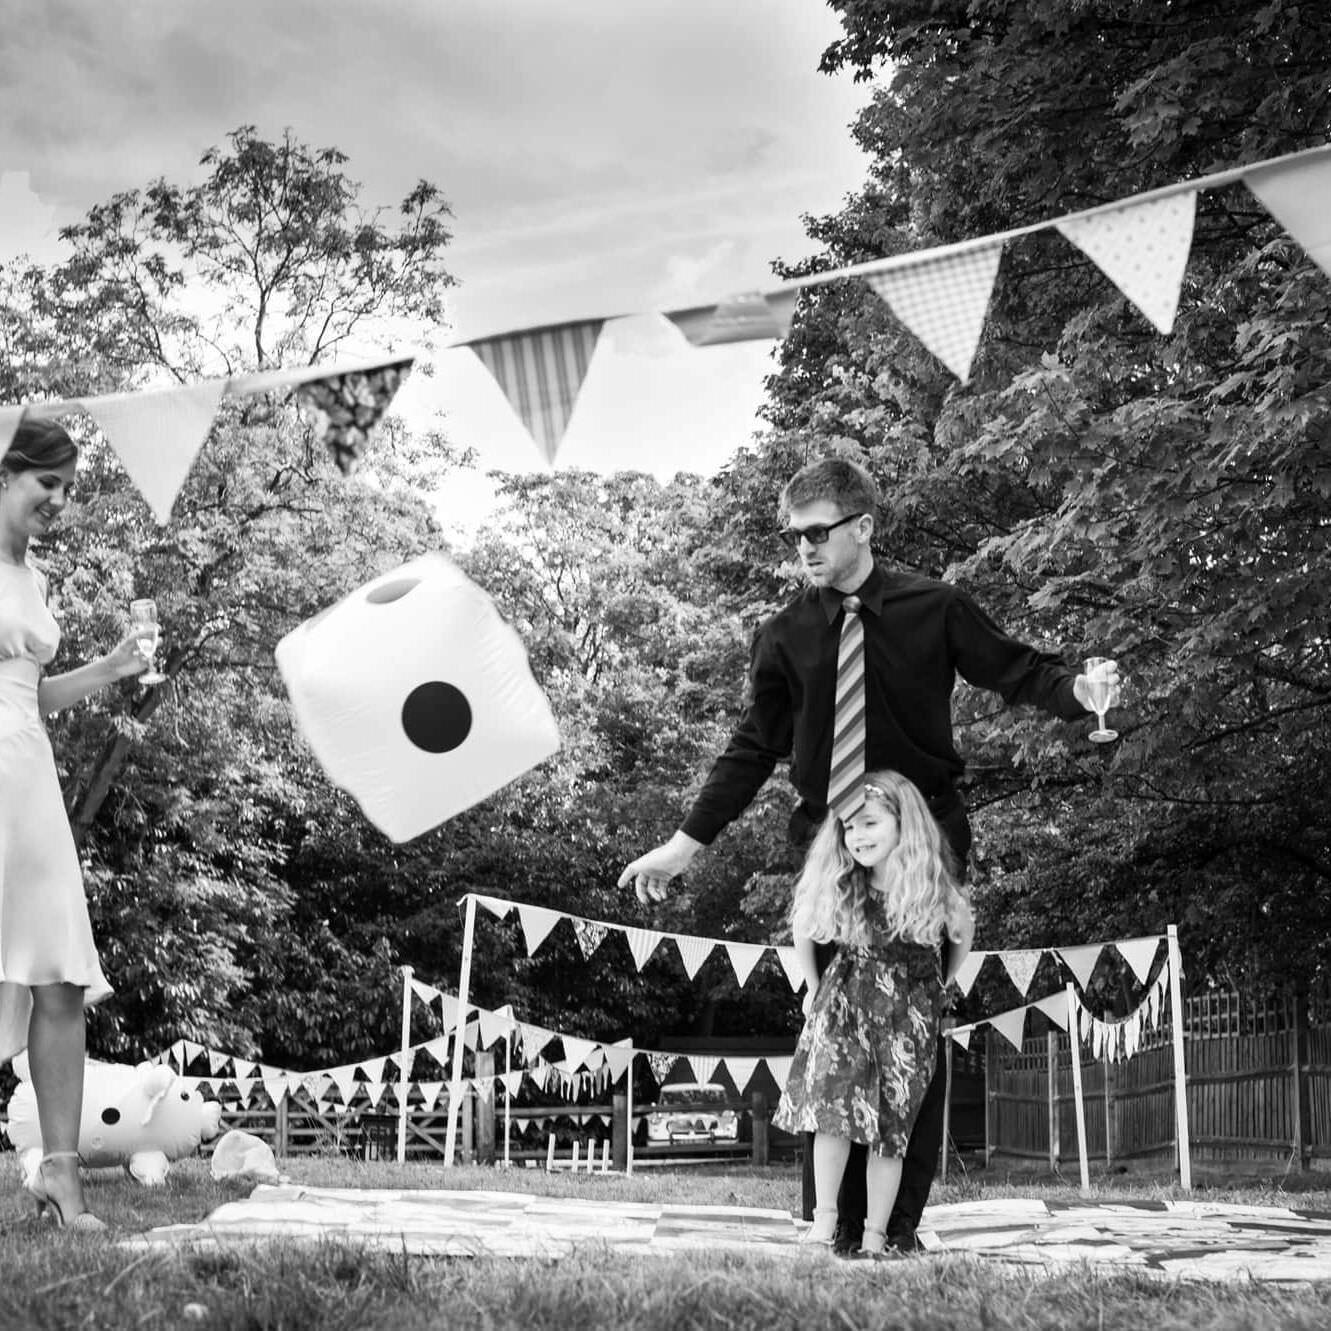 Mark-Seymour-Wedding-Photographer-UK-28 10